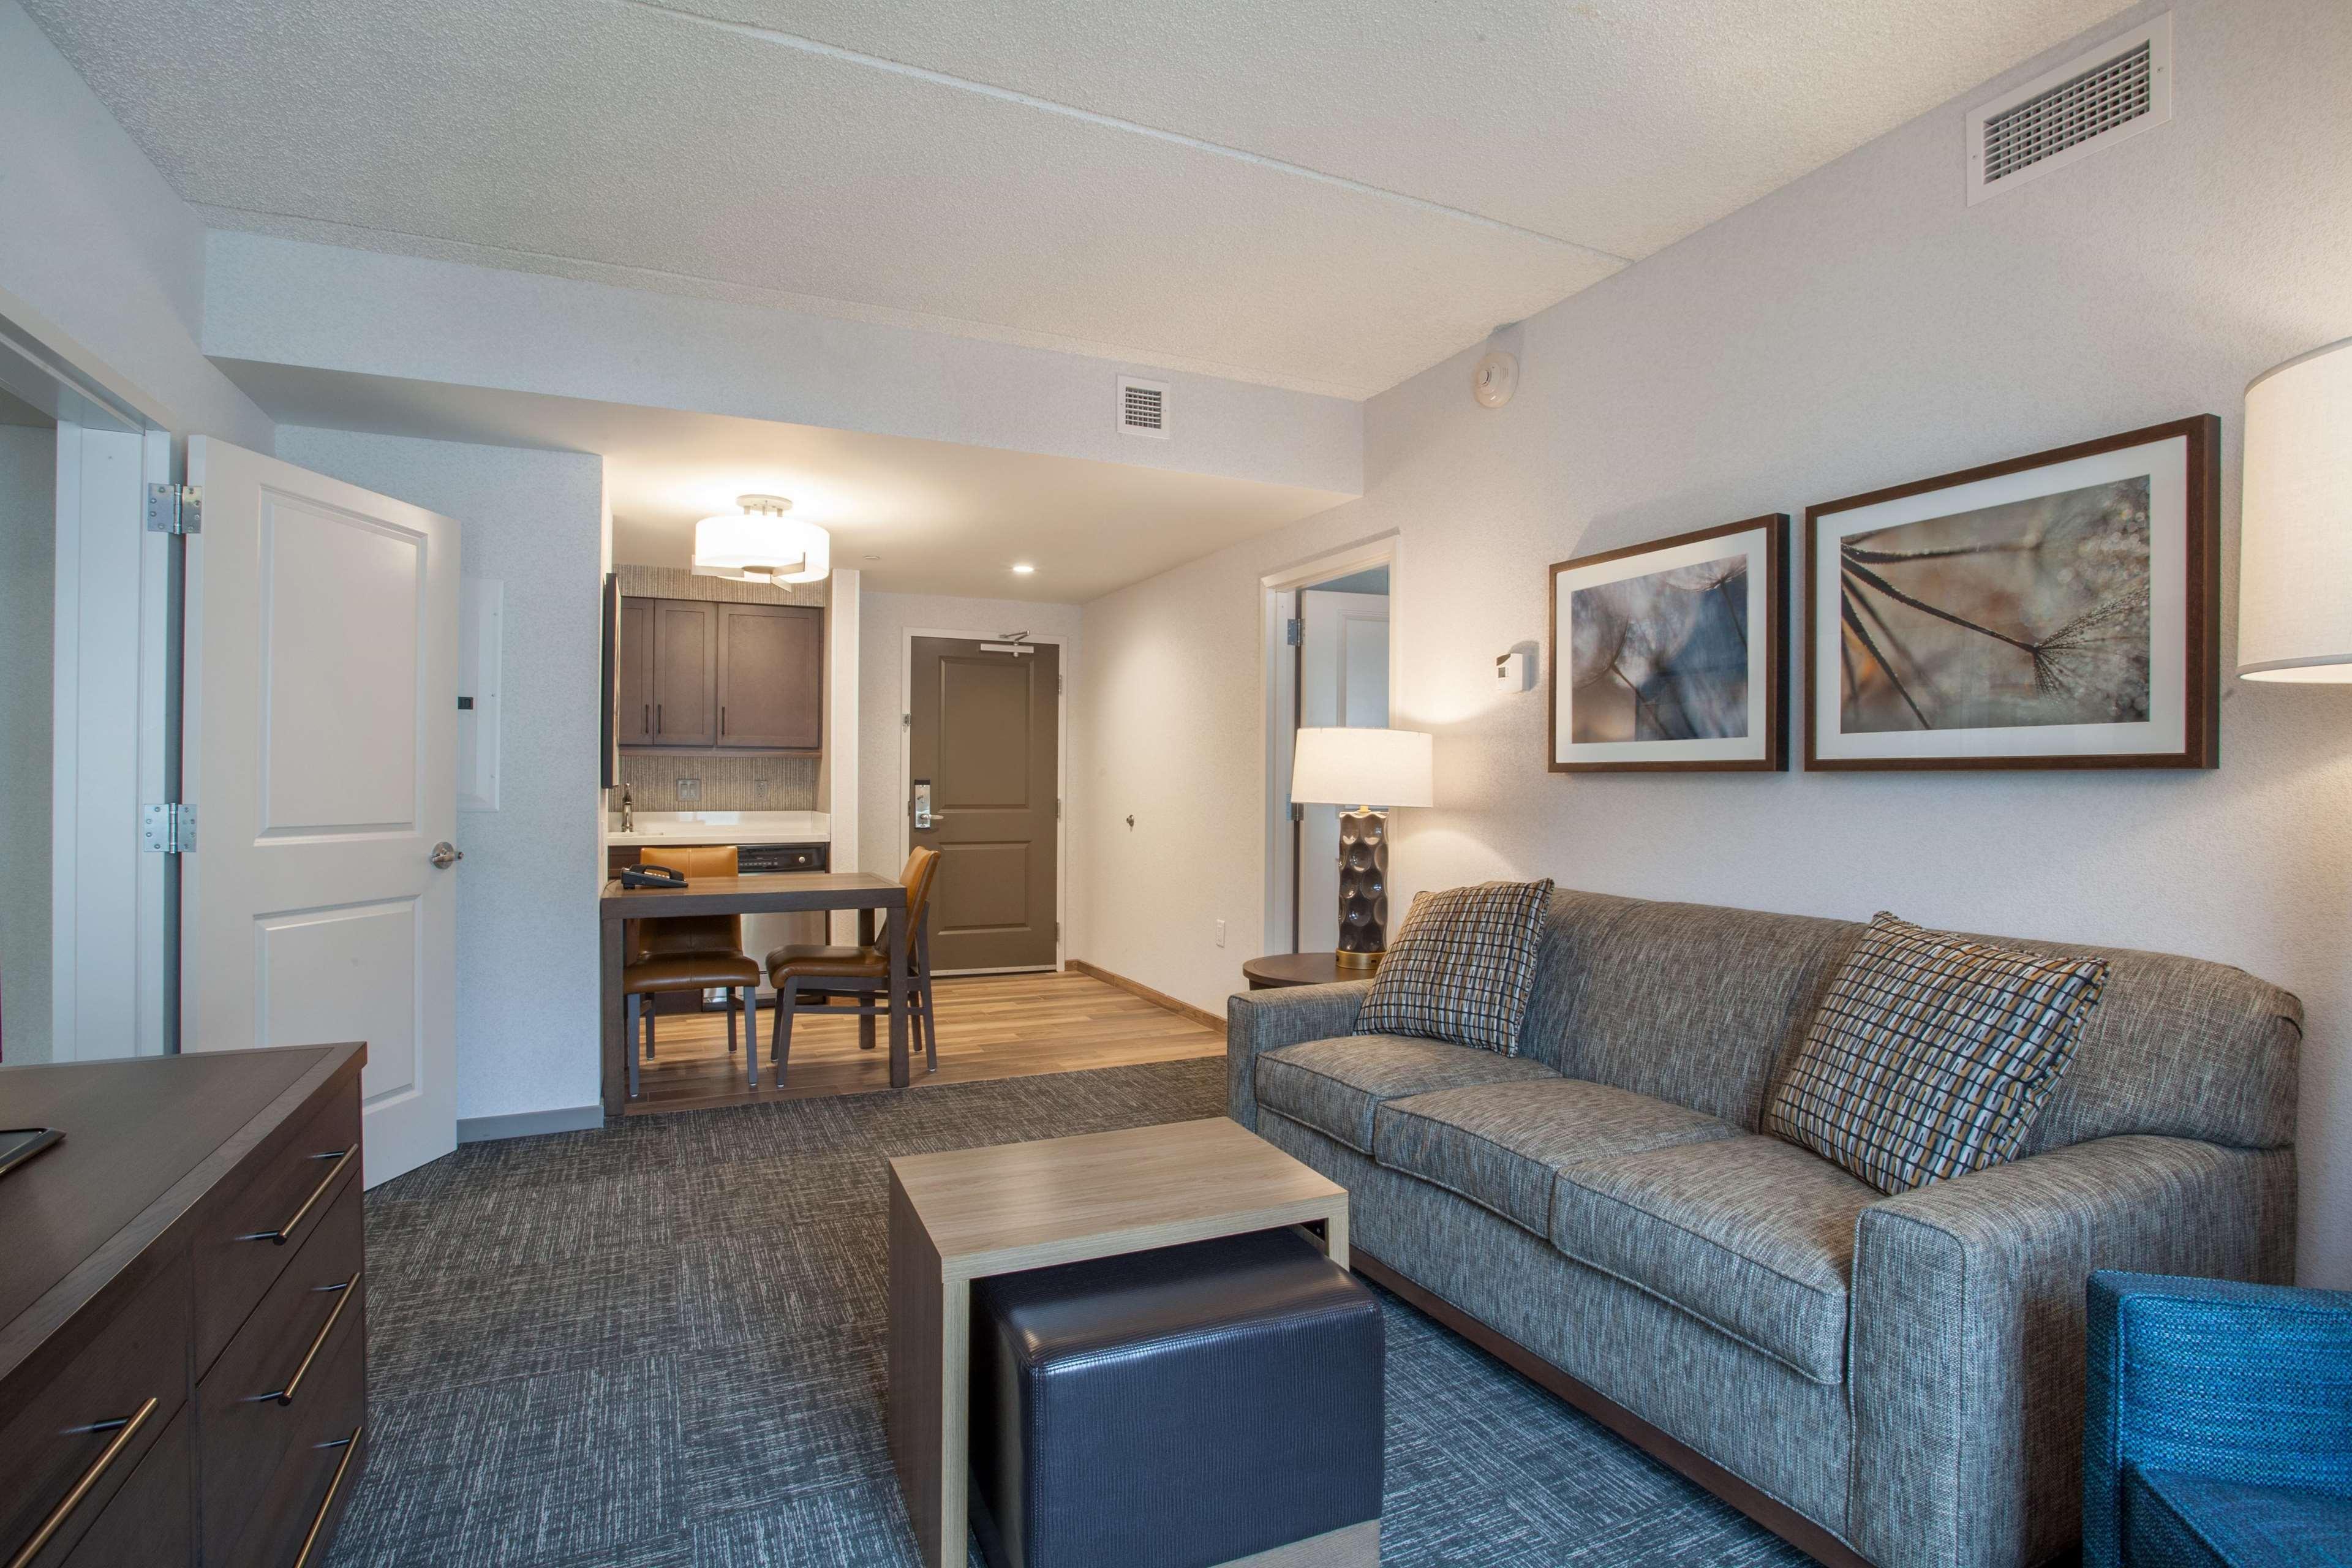 Homewood Suites by Hilton Saratoga Springs image 44